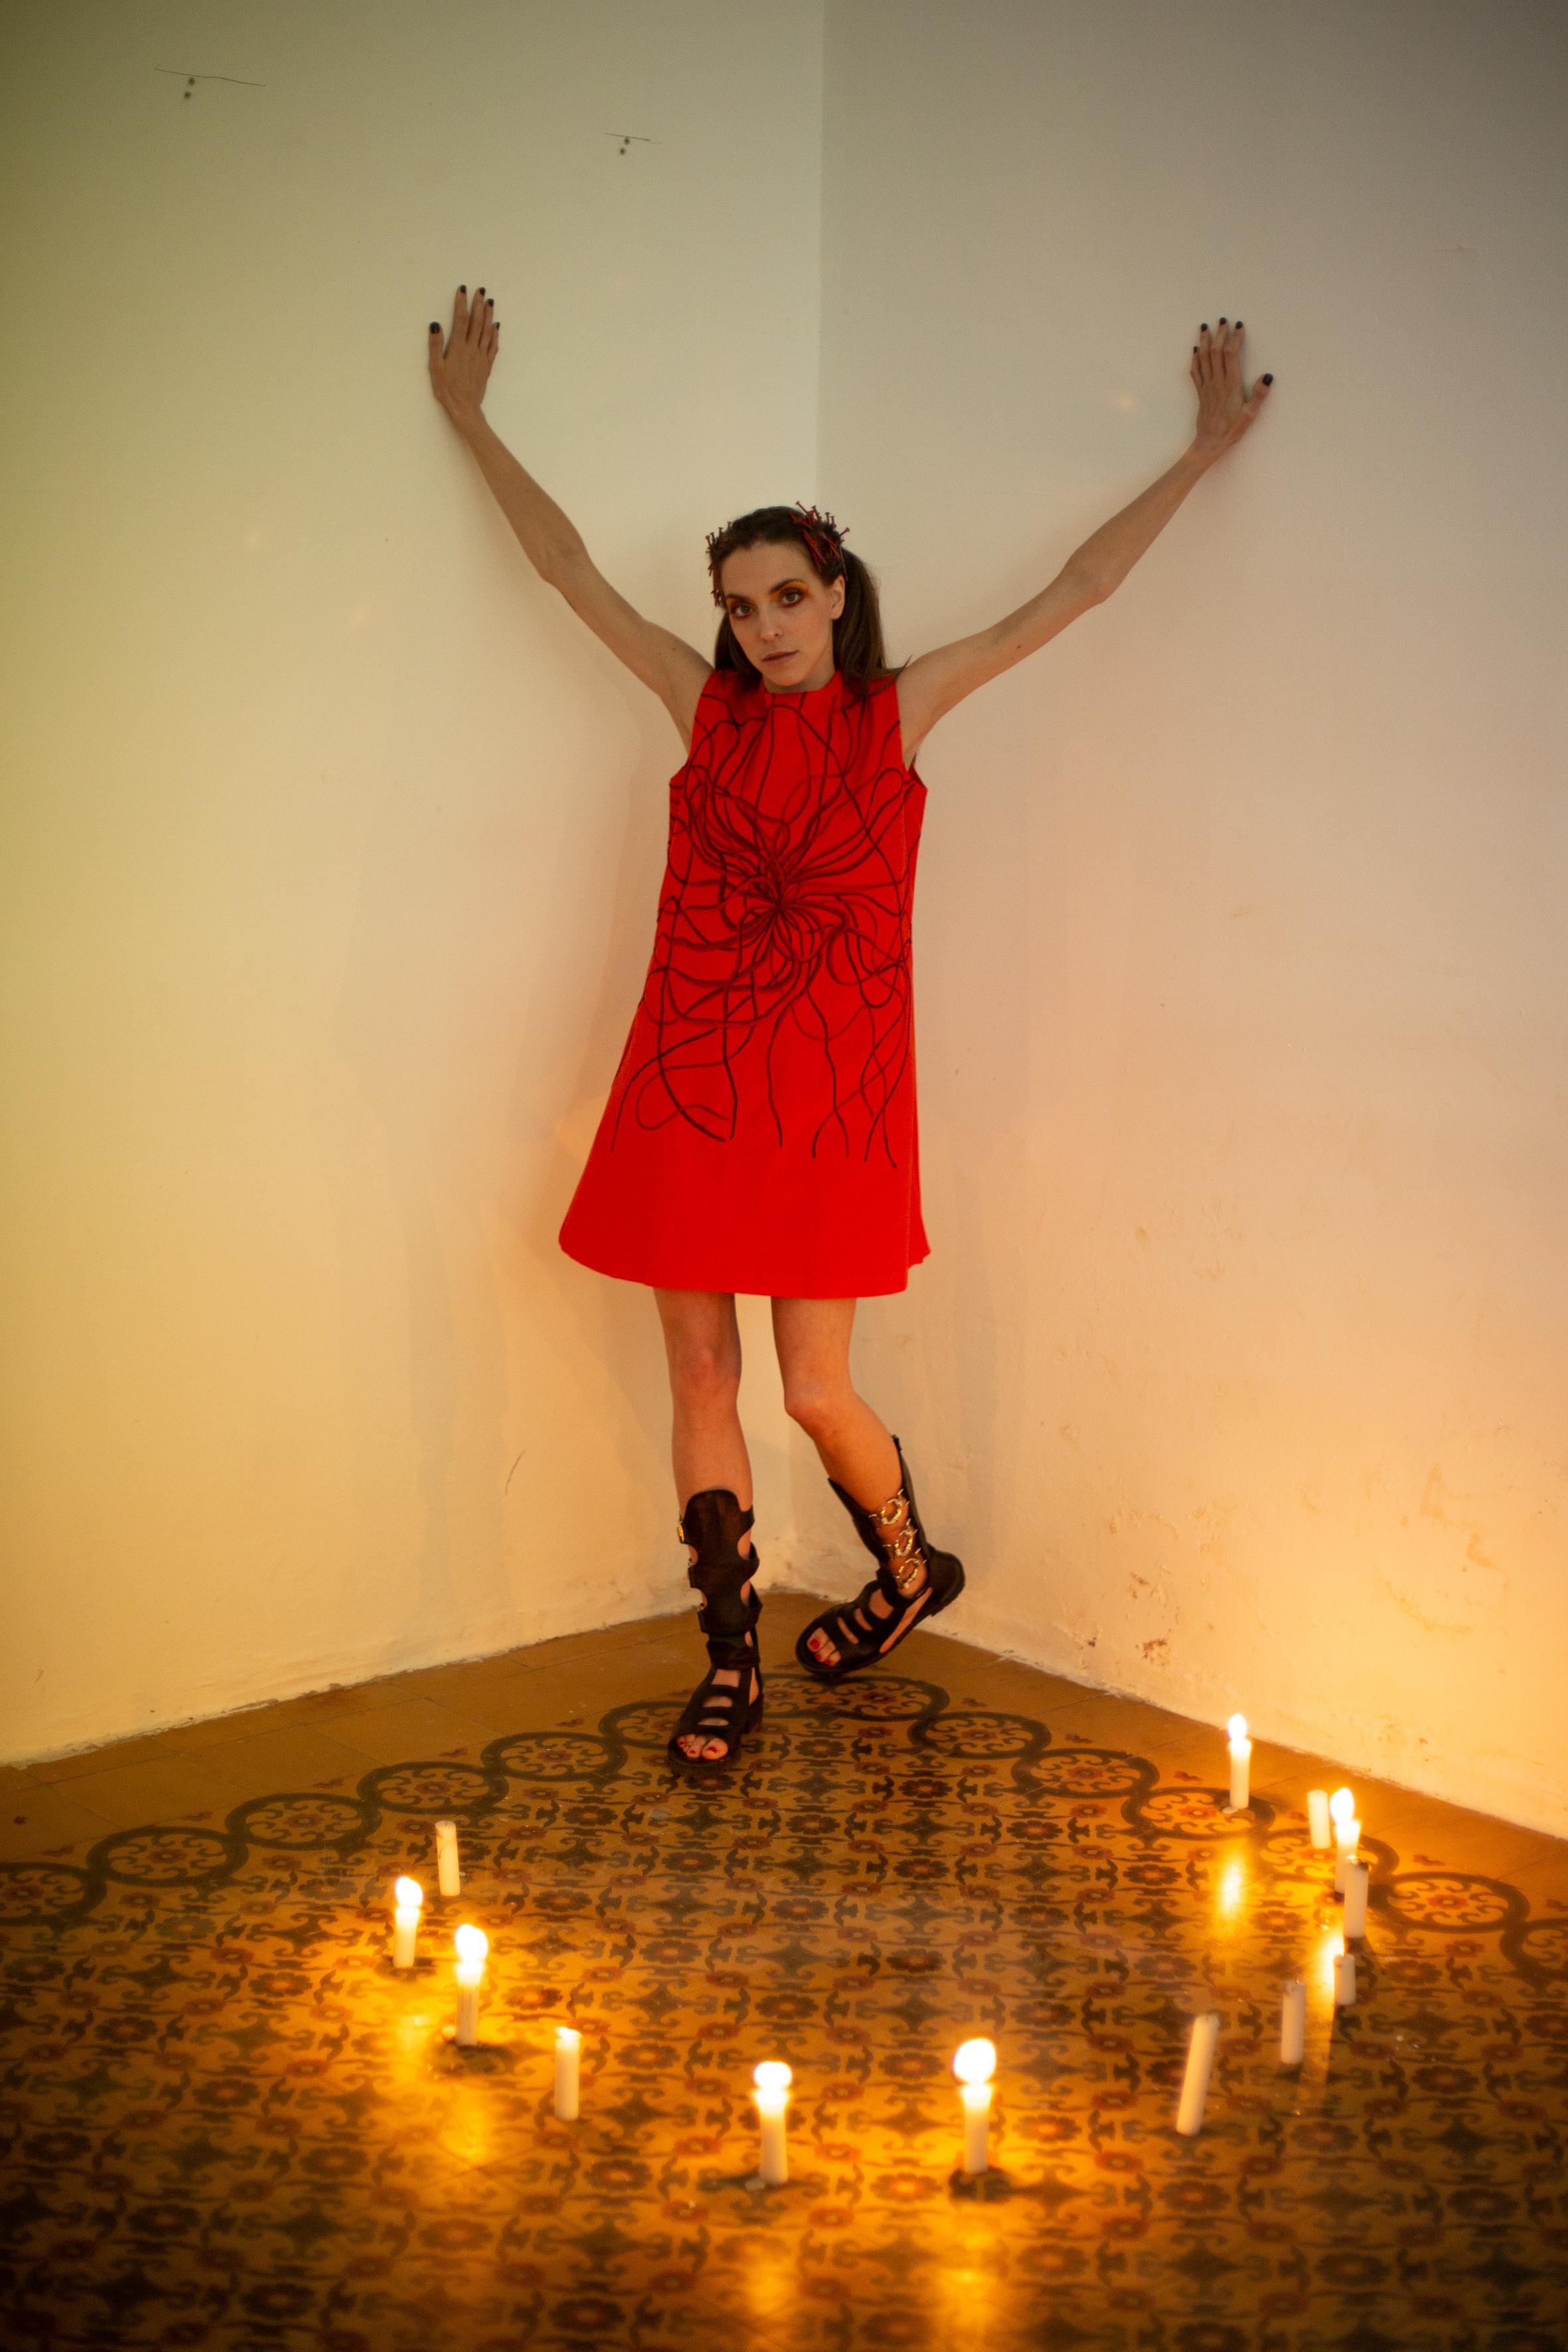 dala-eido-summoning-summer-red-dress-candles.jpg